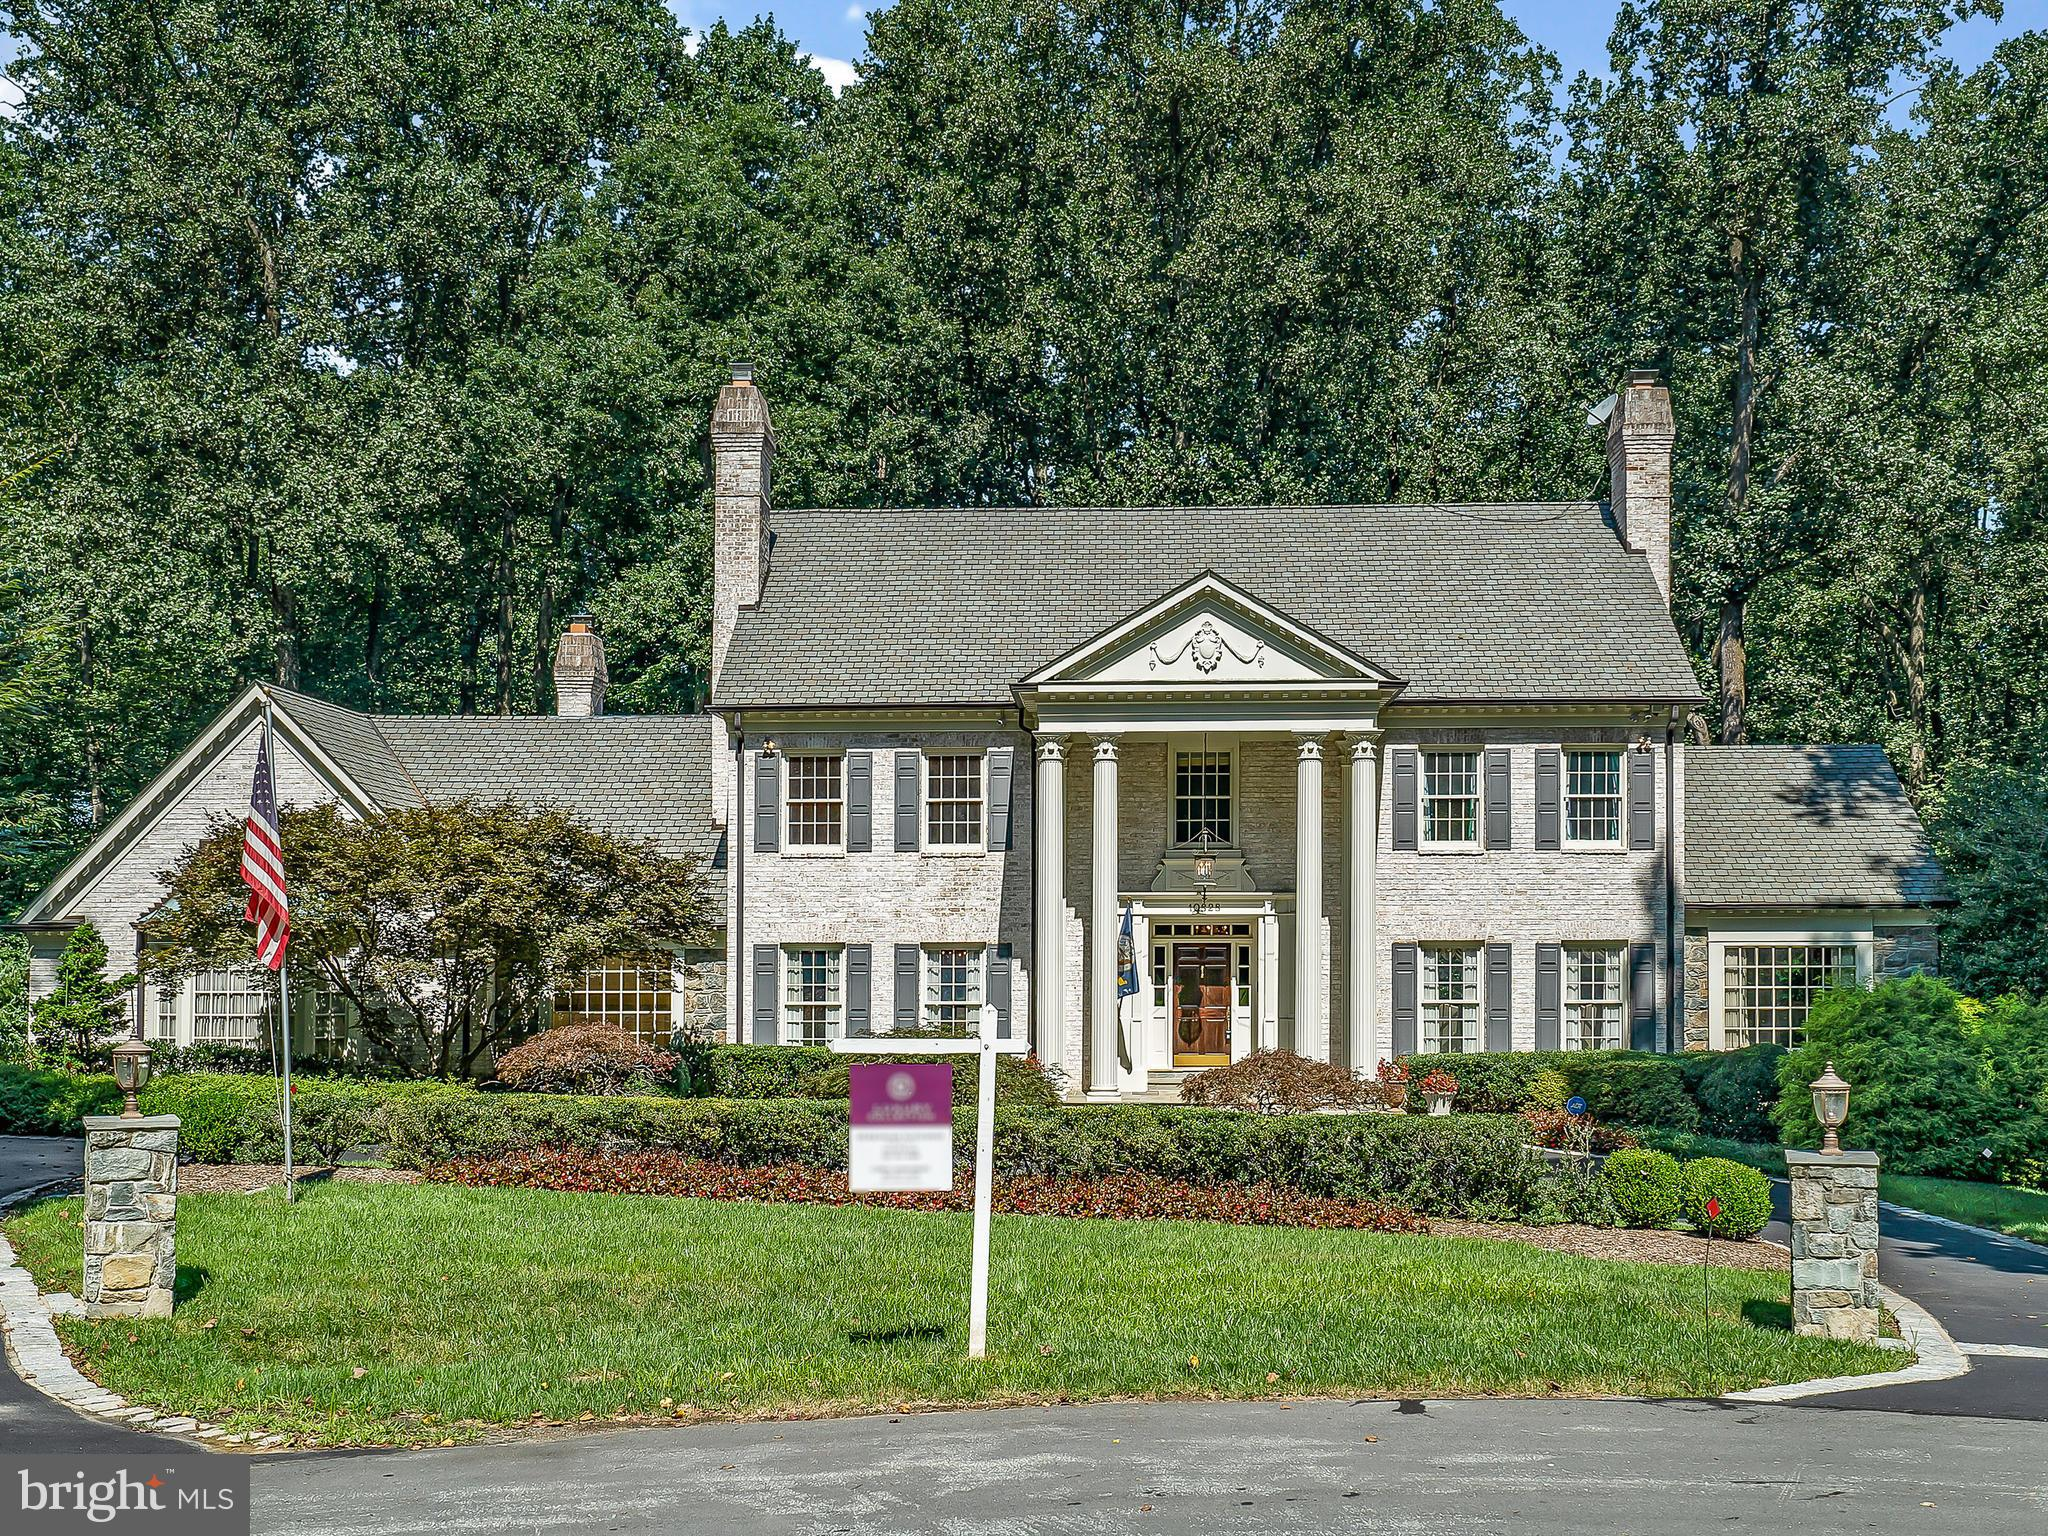 10828 Lockland Rd, Potomac, MD, 20854